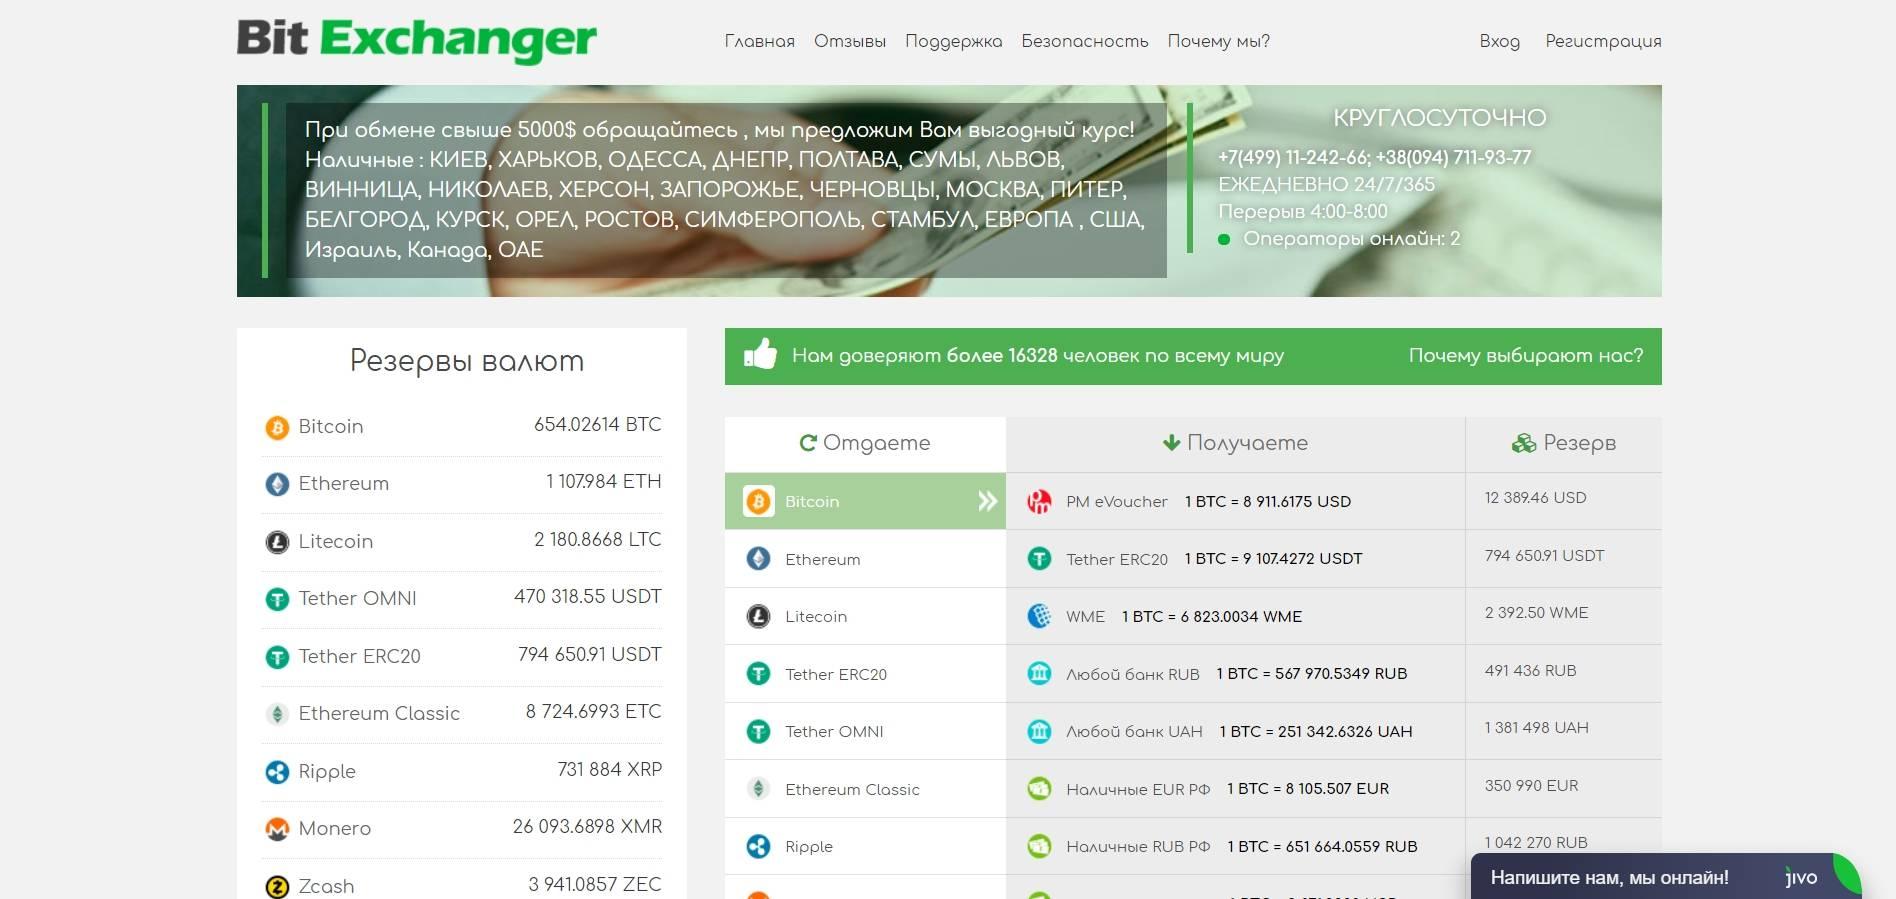 BitExchanger